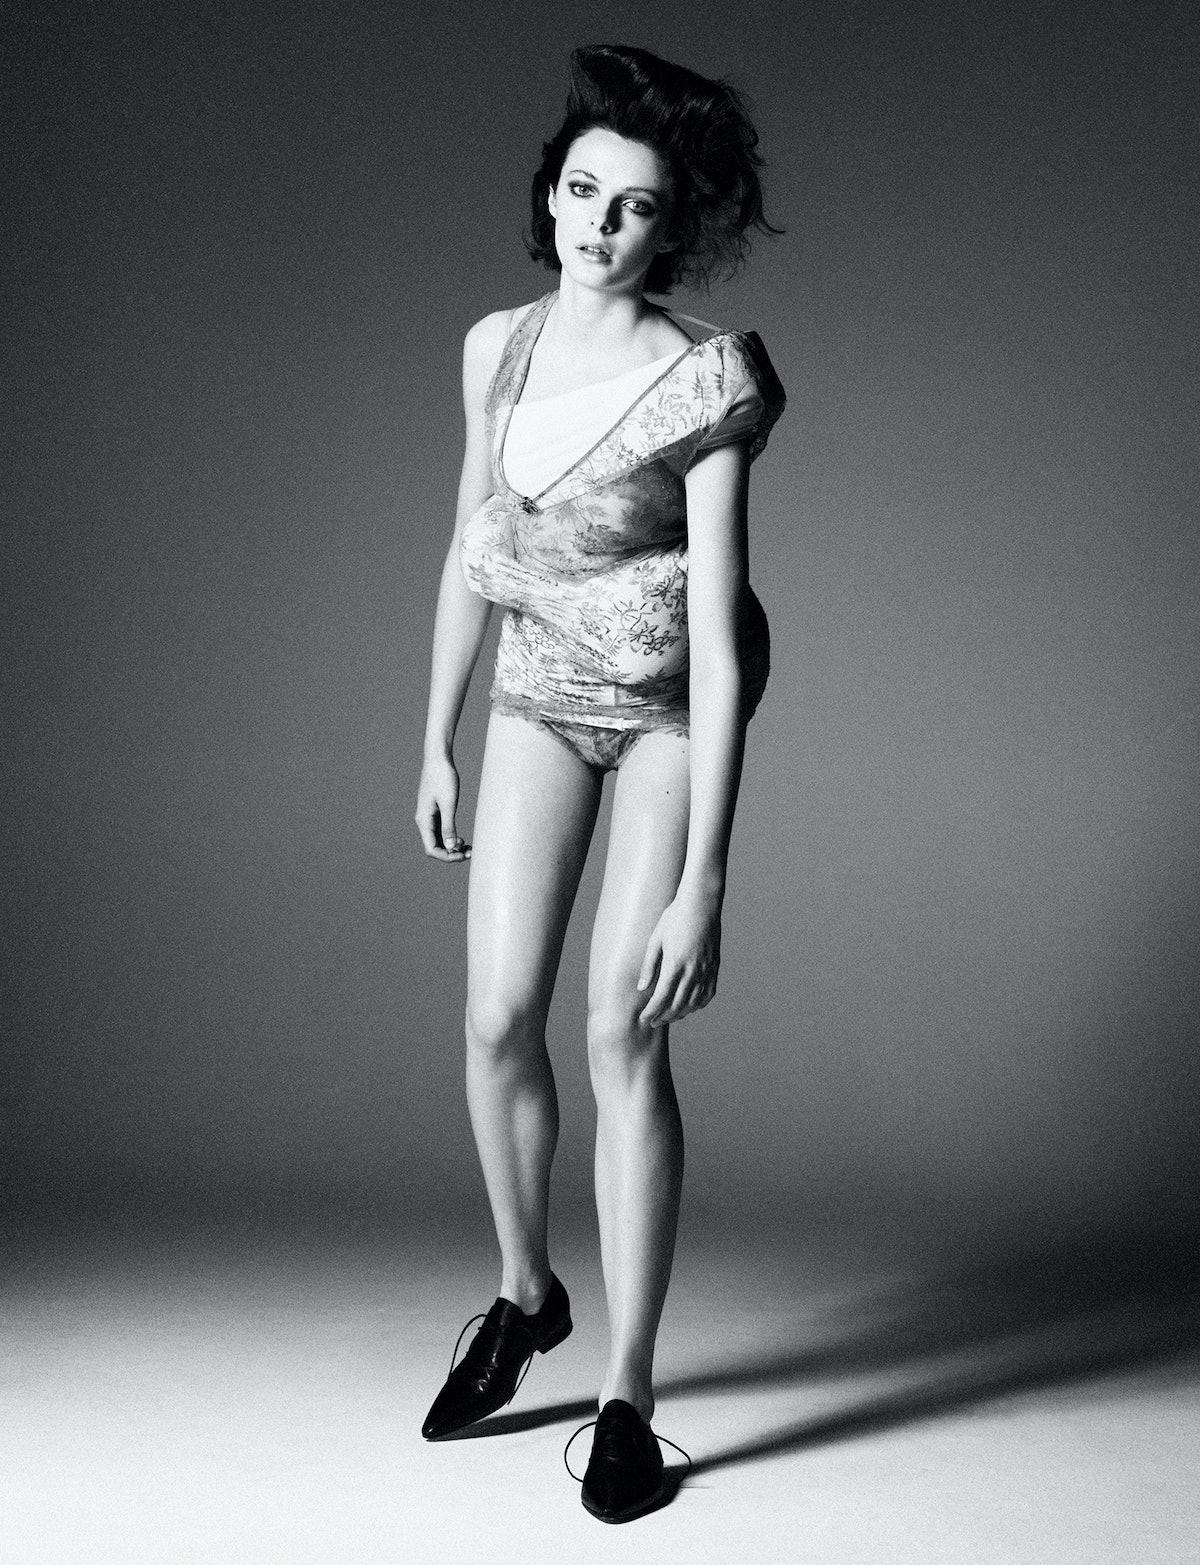 Model Grace Clover wears a Gucci dress and shorts; Maison Margiela shoes.